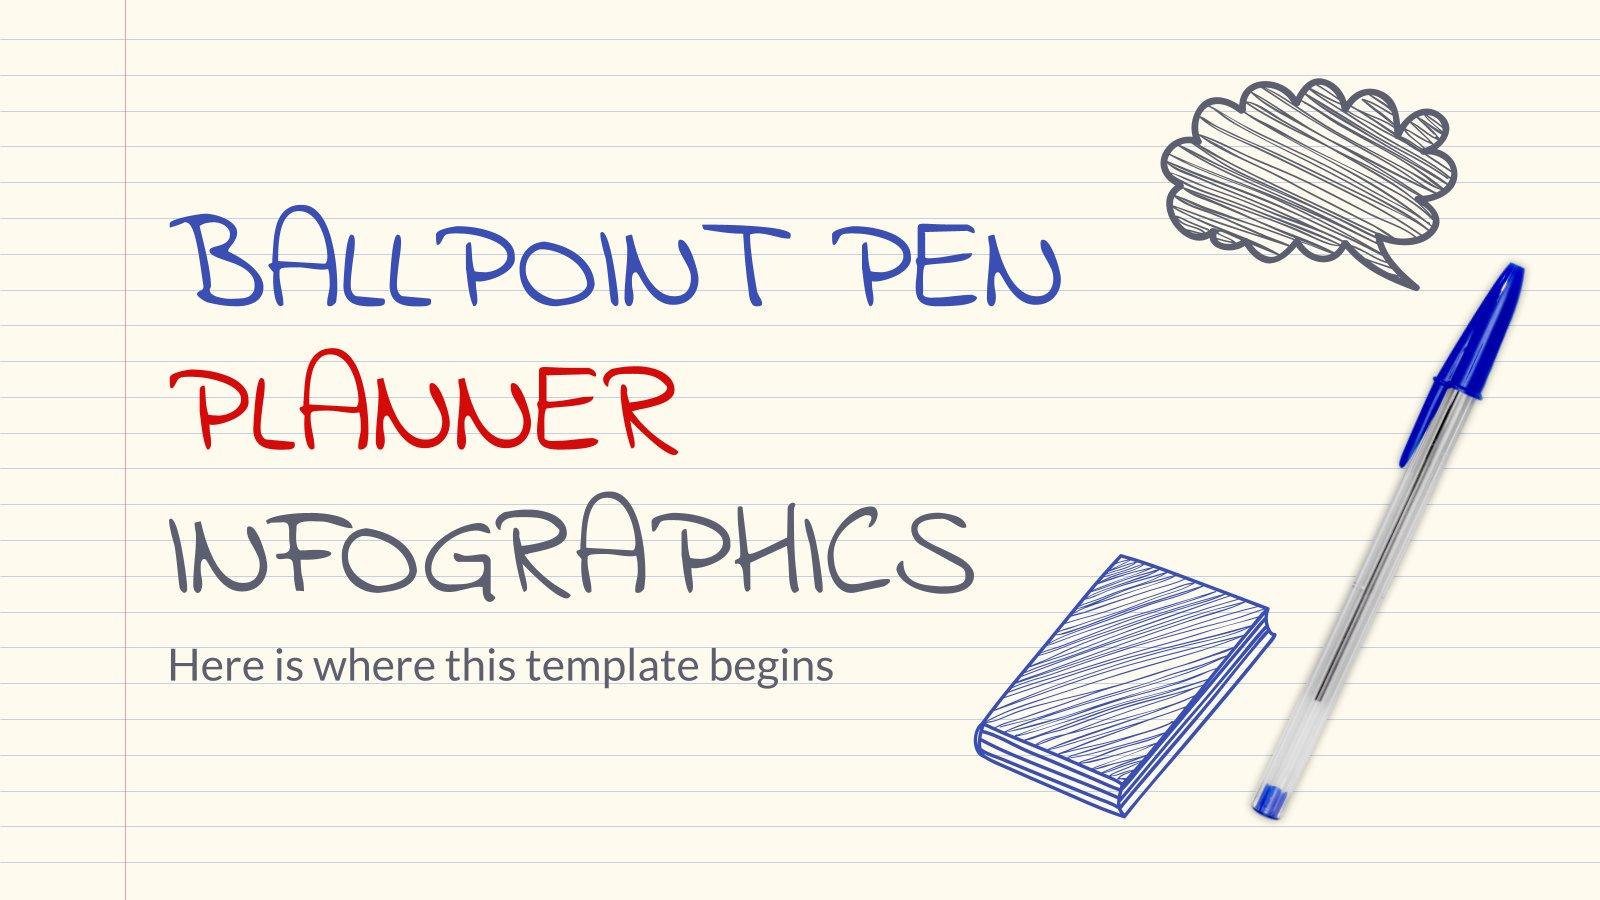 Ballpoint Pen Planner Infographics presentation template